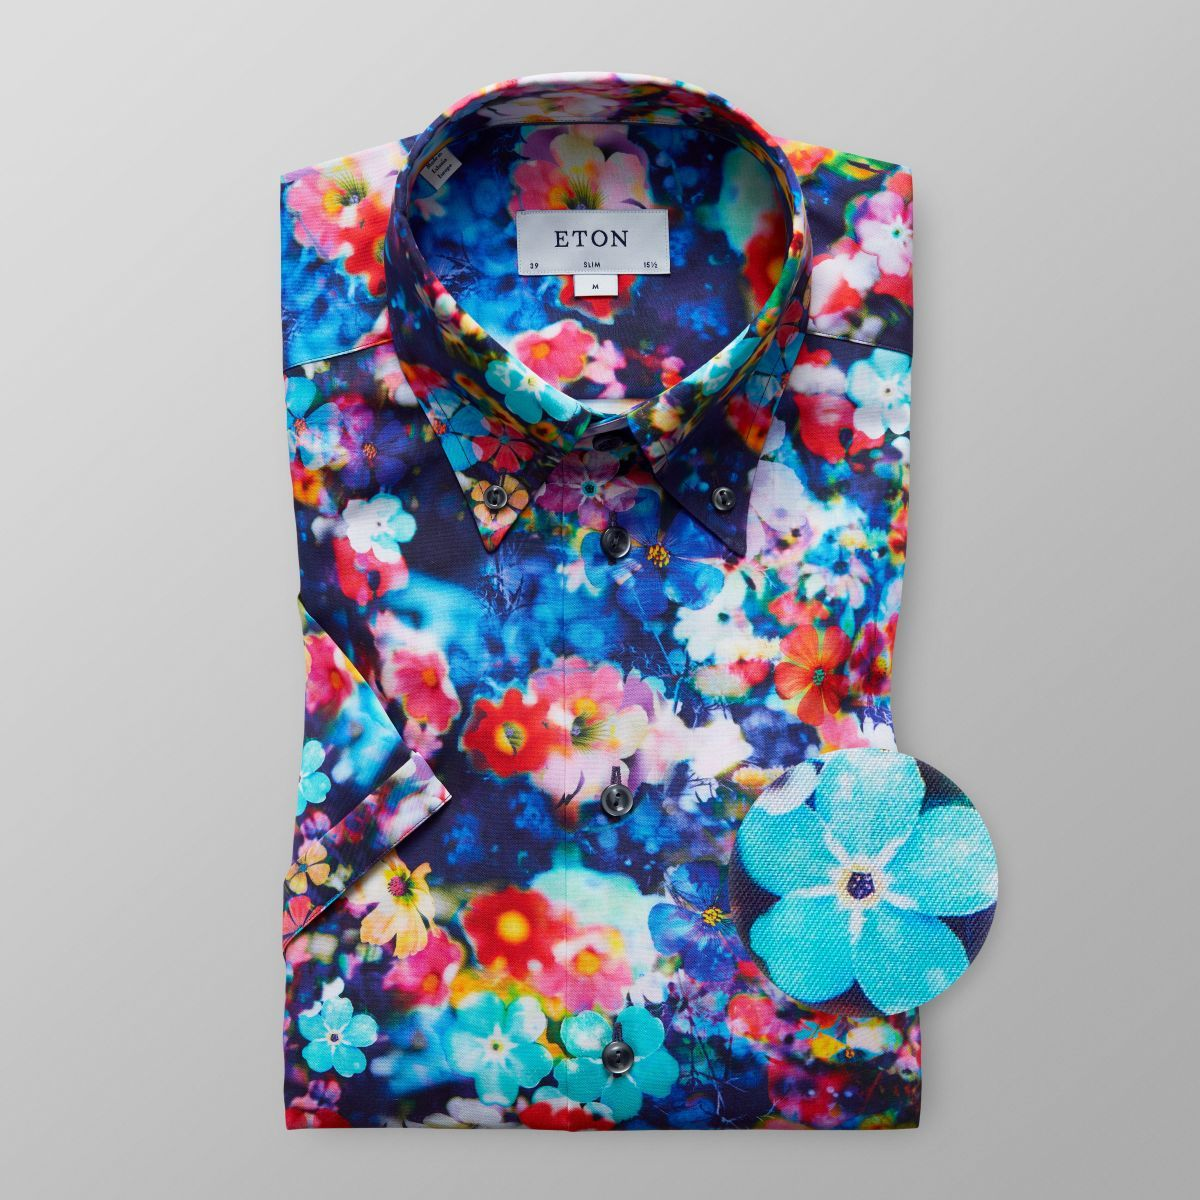 Flerfärgad blommig skjorta - Slim fit  c098e910fb0be